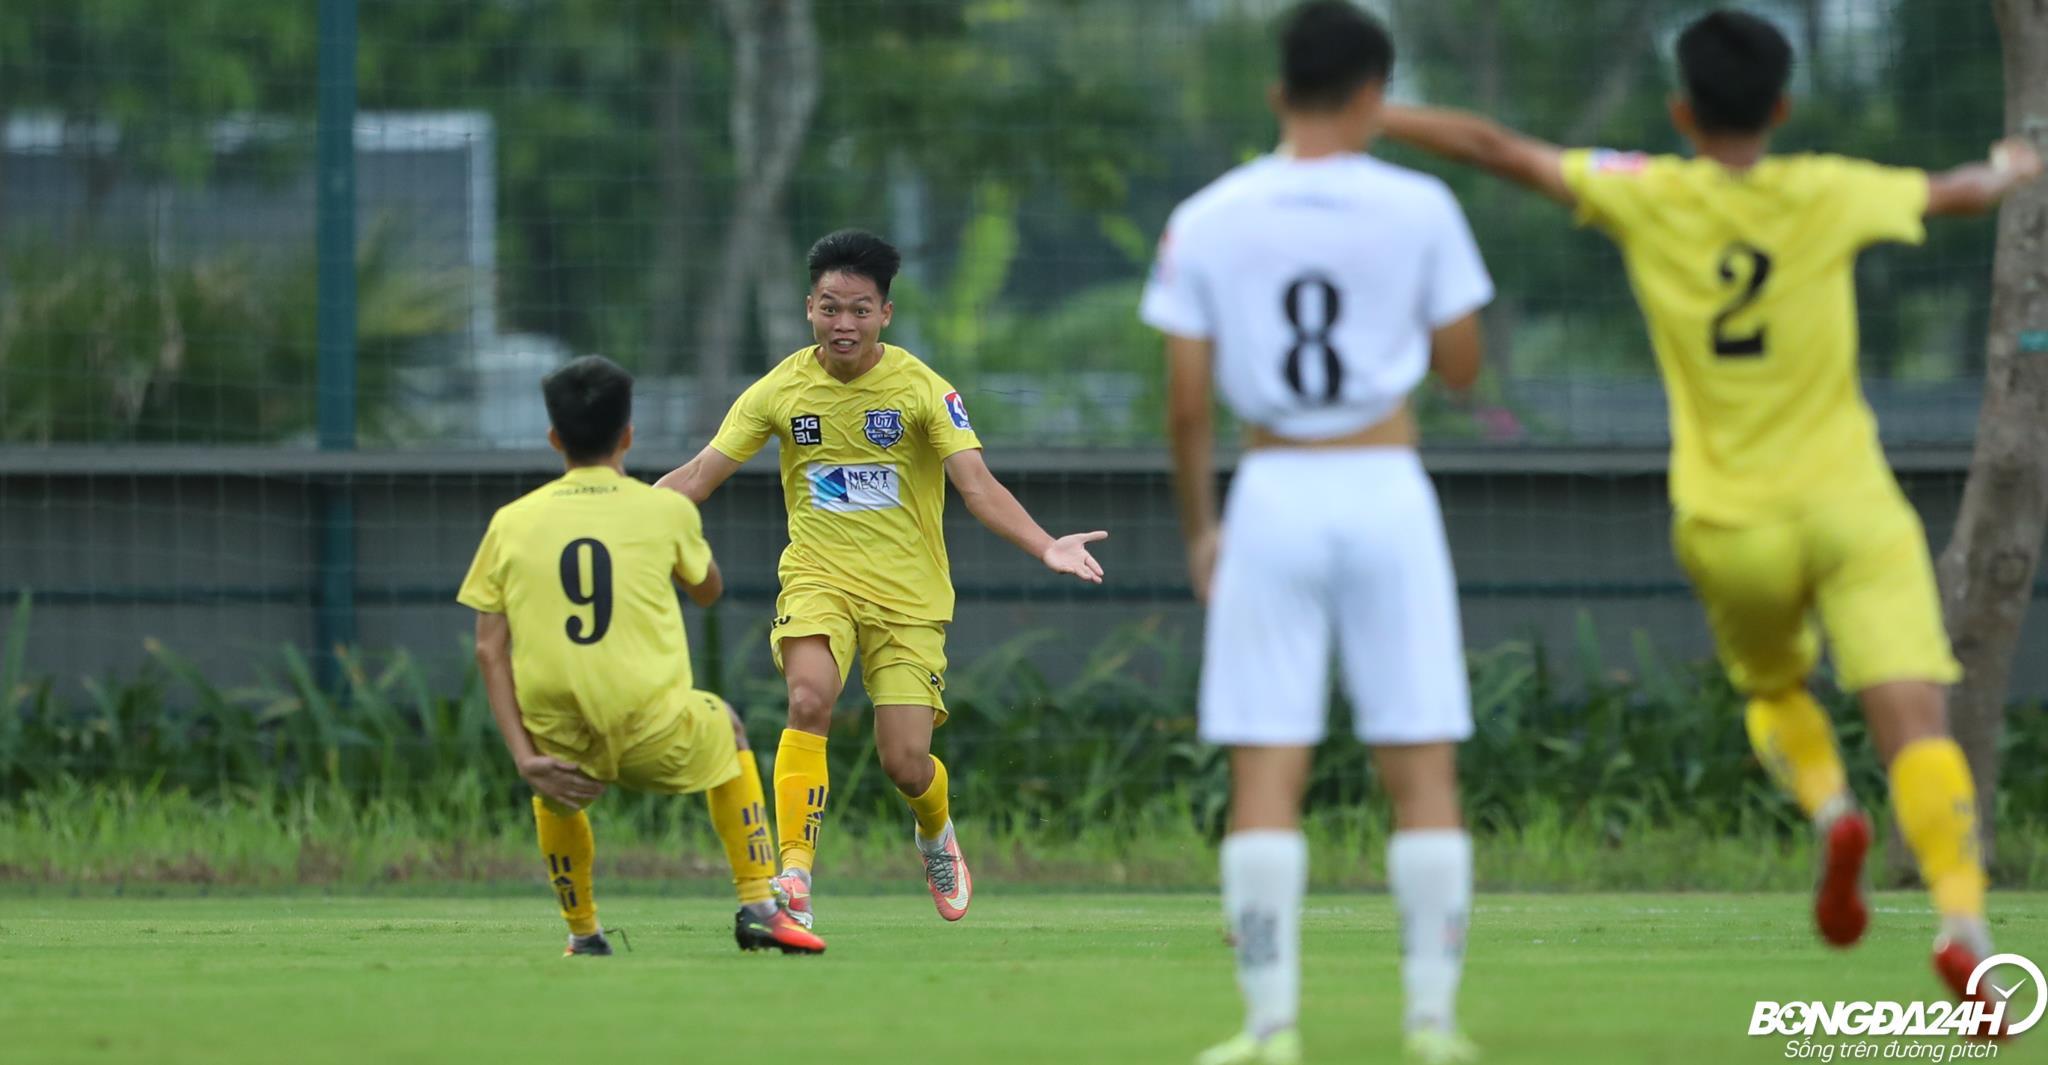 Ho Van Cuong U17 SLNA vs U17 Nutifood